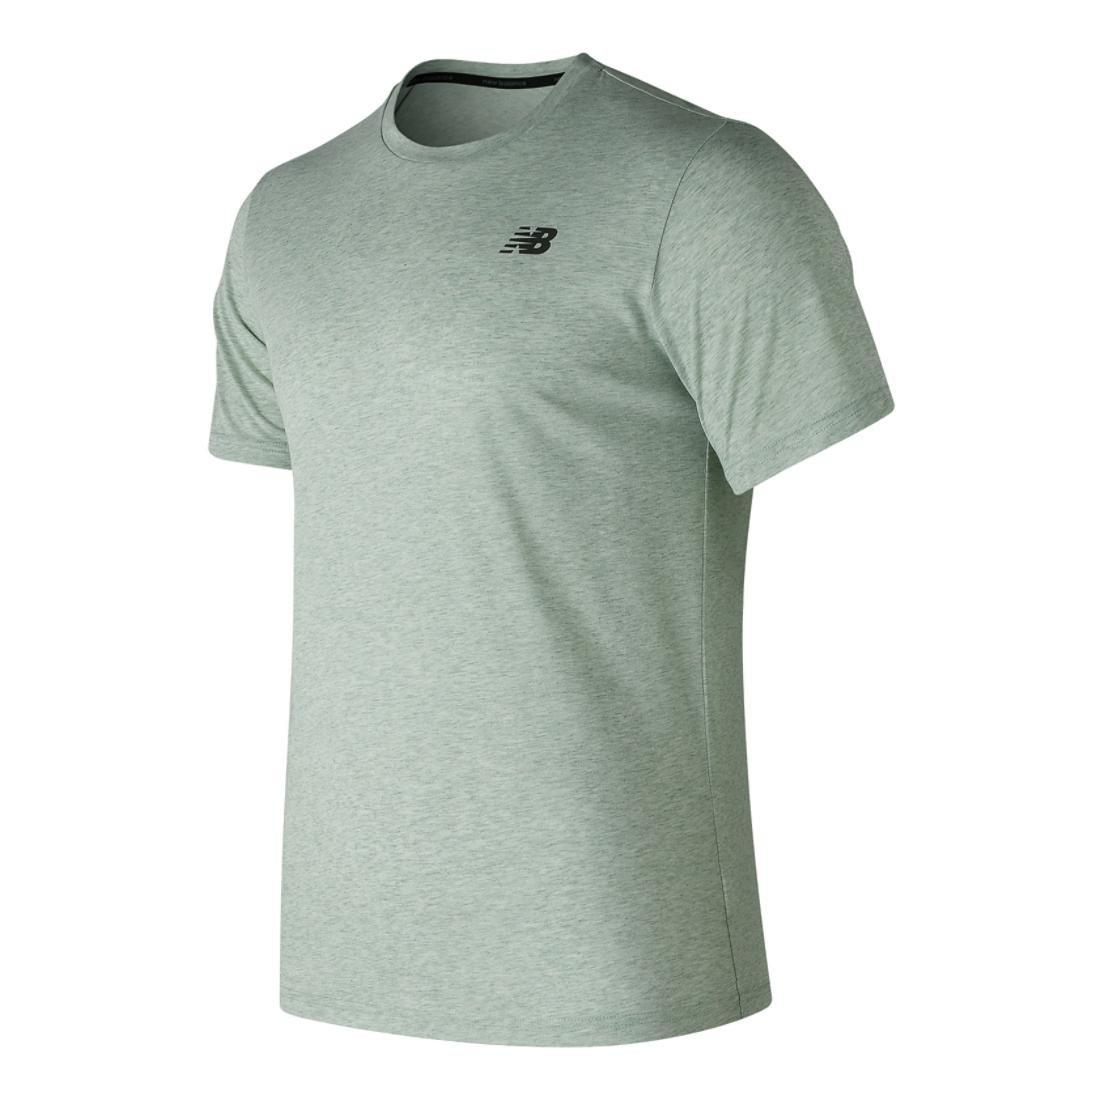 New Balance Men's Heather Tech Shorts Sleeve Shirt, Silver Mint, Small